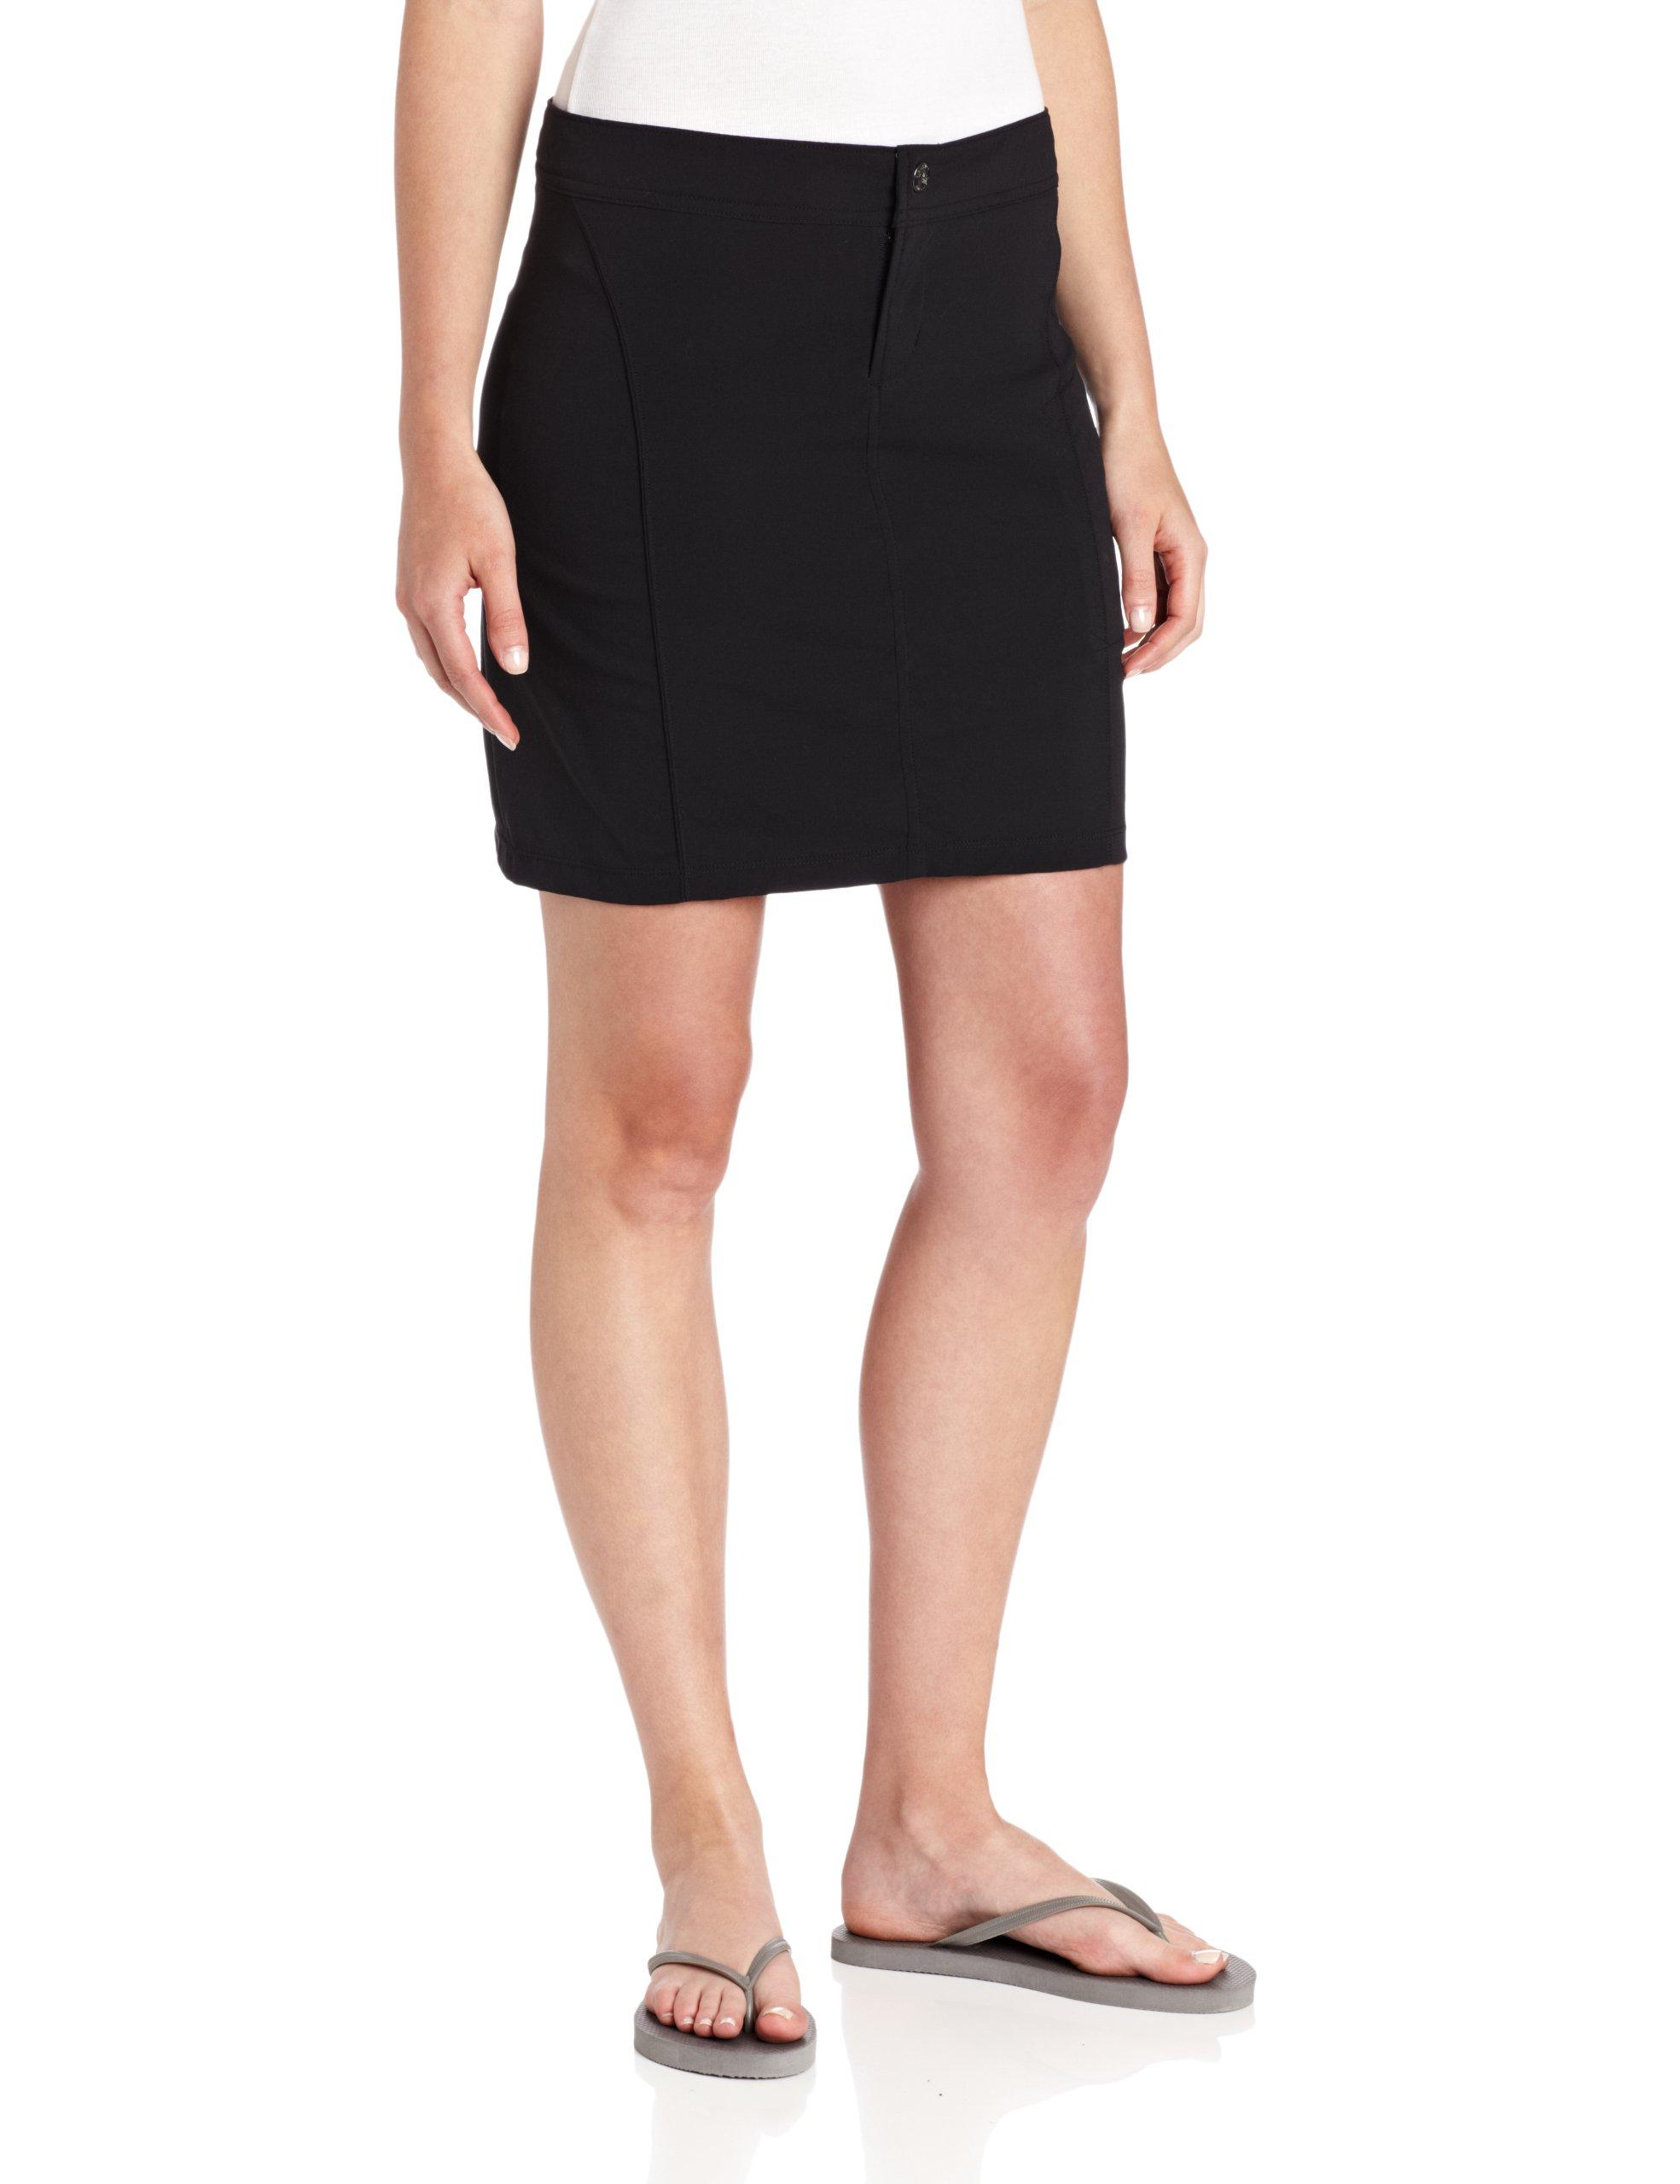 Columbia Women's Just Right Skort Skirt, -black, 8